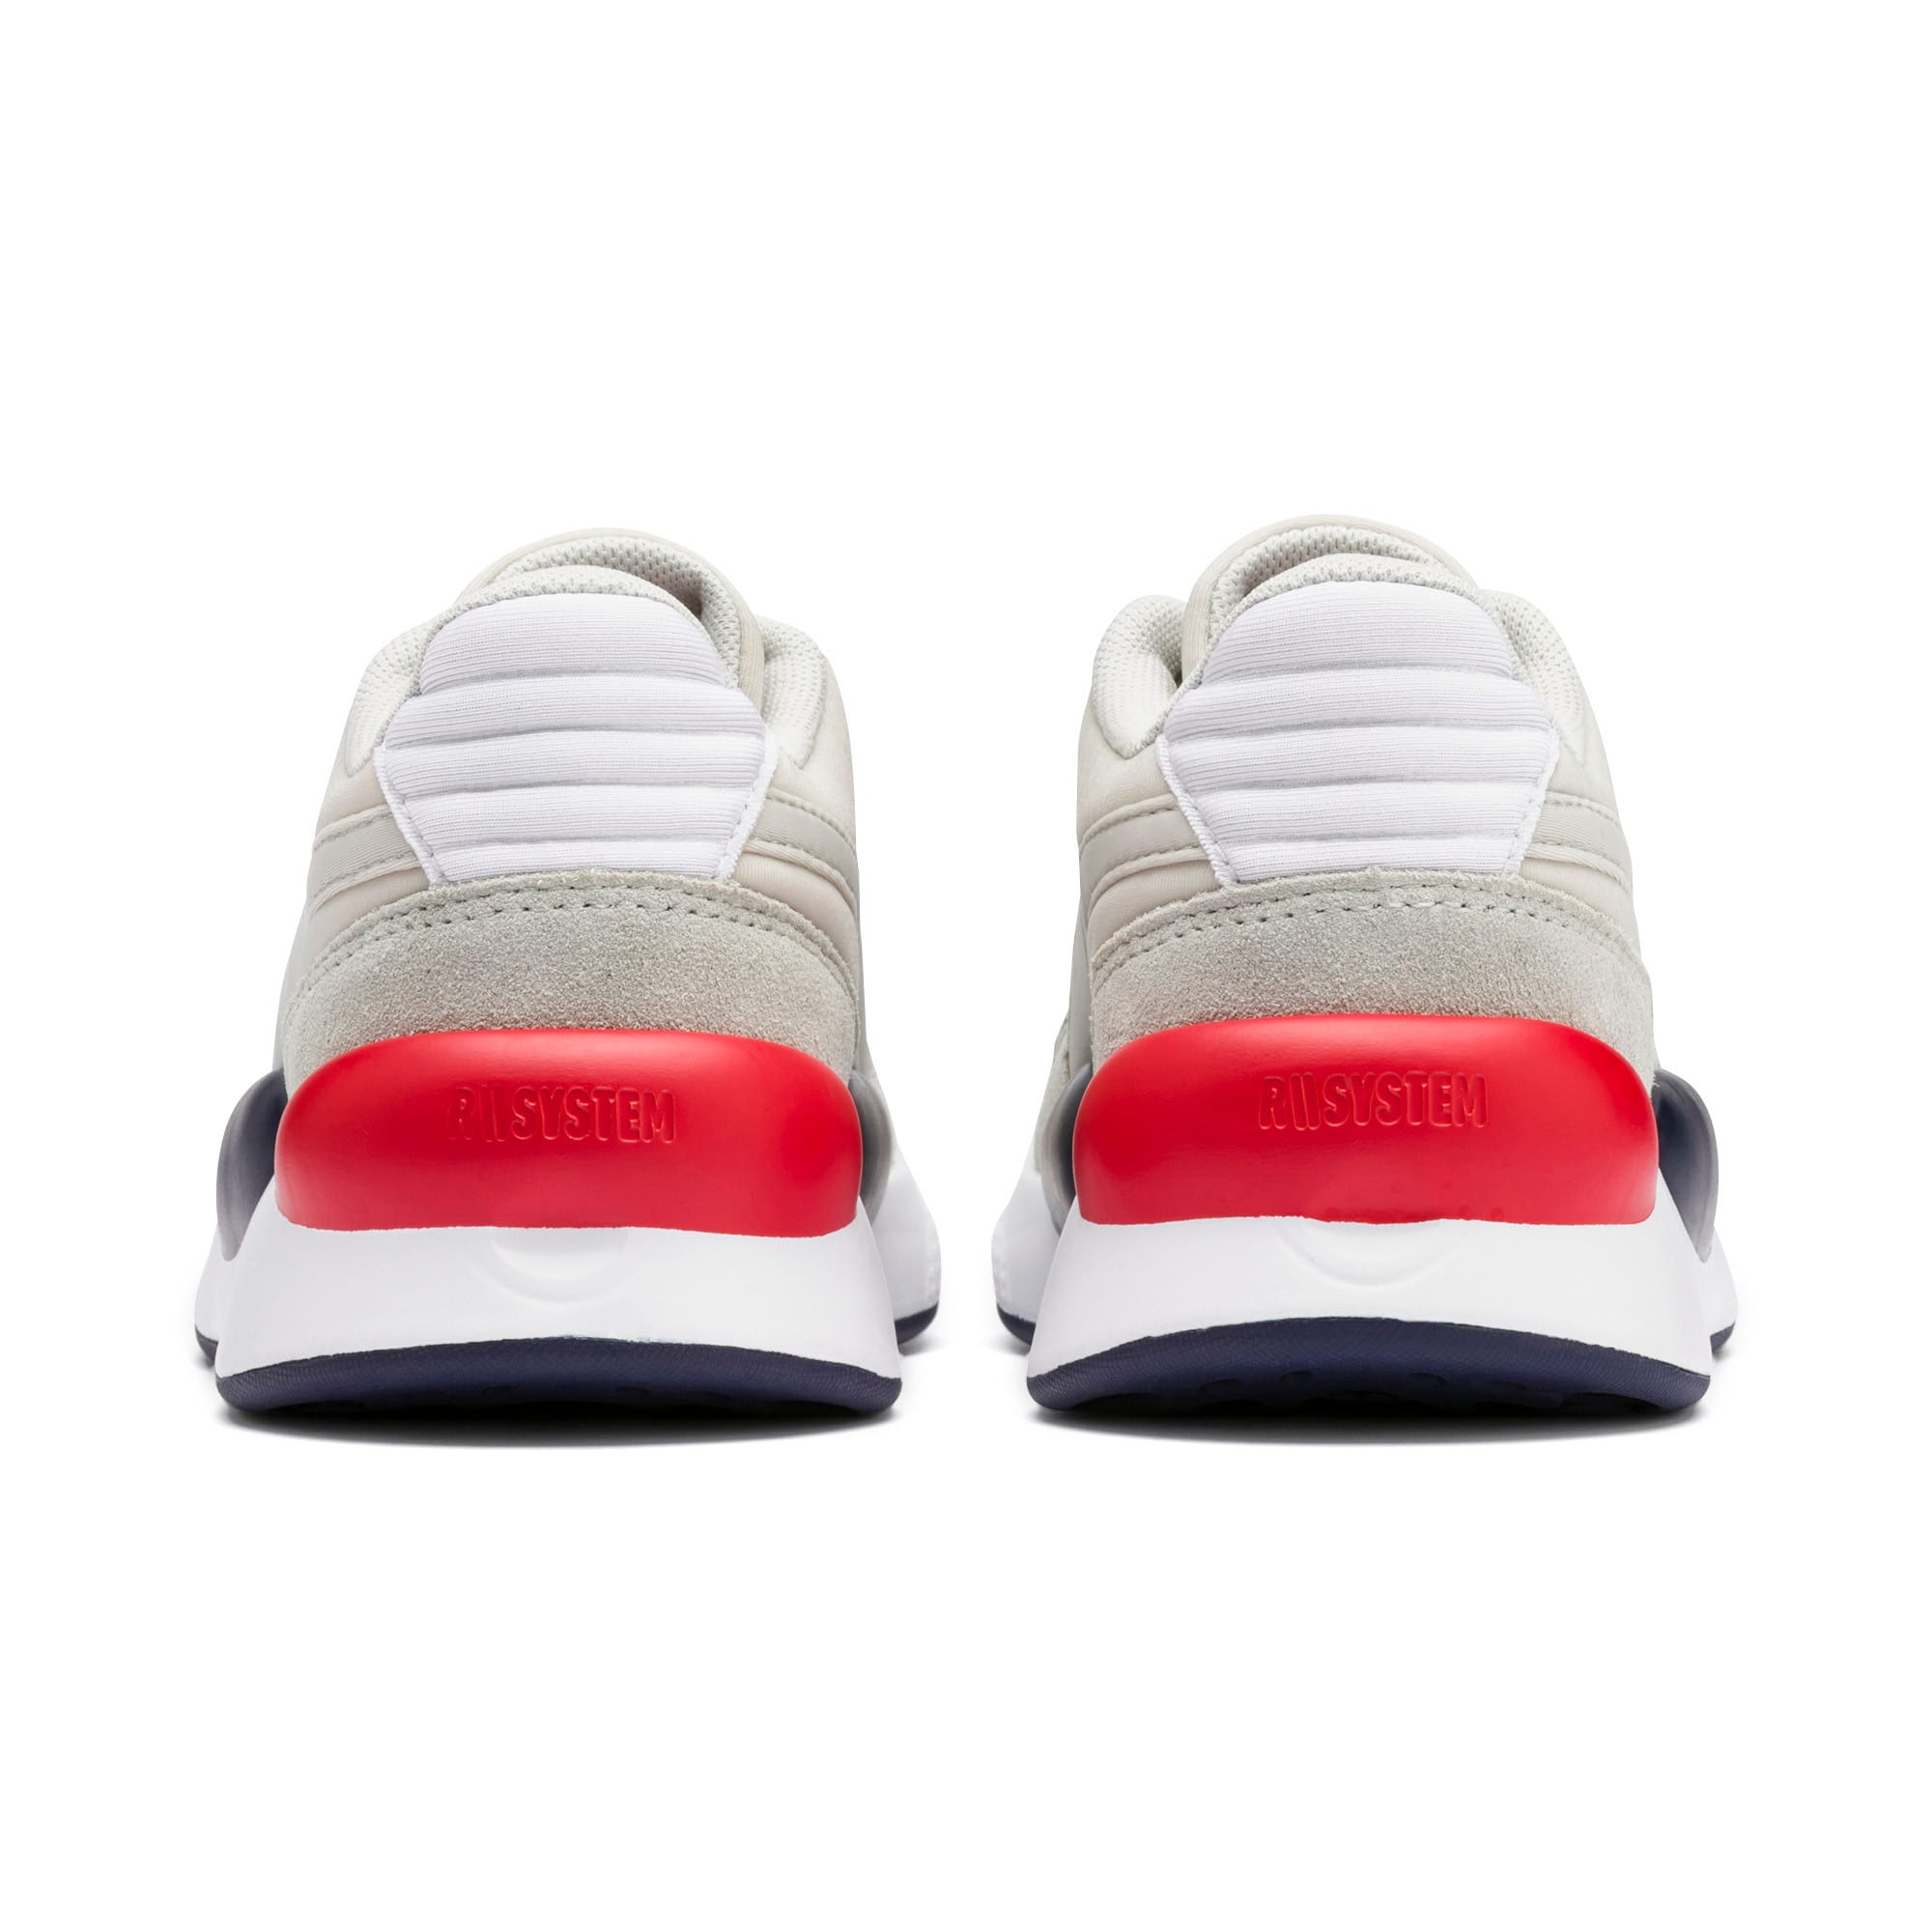 Thumbnail 3 of RS 9.8 Gravity Little Kids' Shoes, Gray Violet-Peacoat, medium